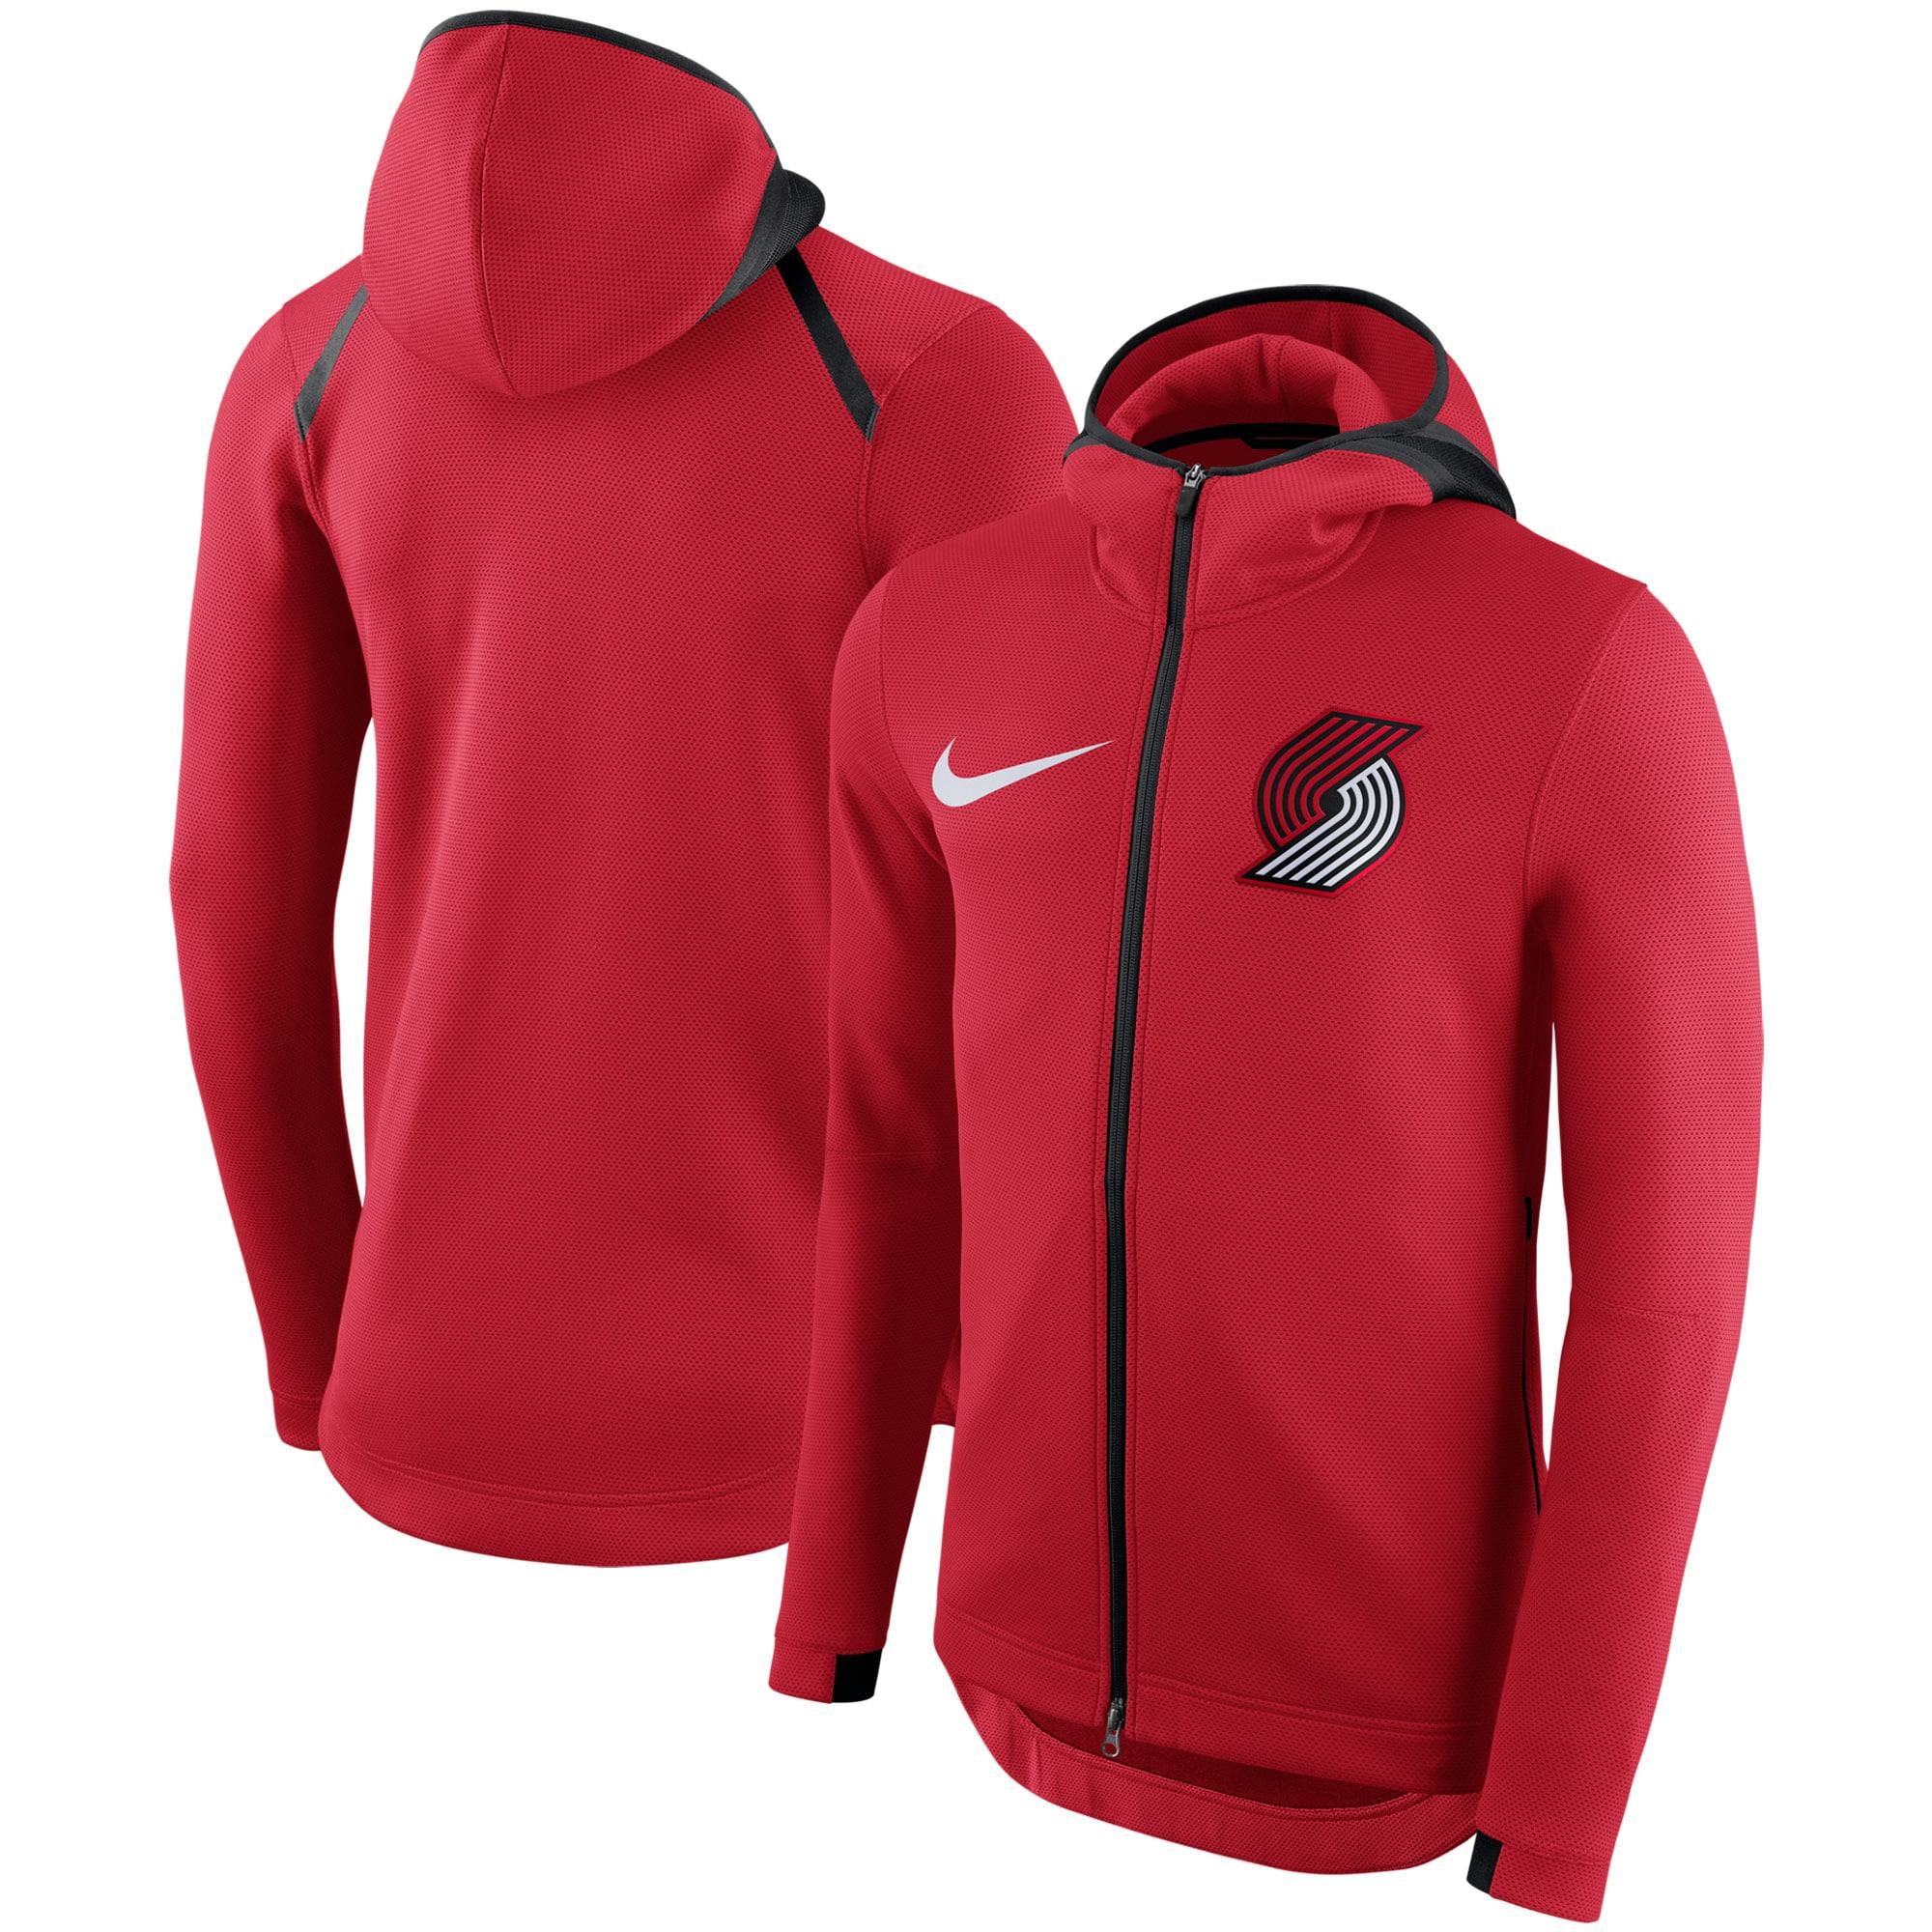 Portland Trail Blazers Nike Showtime Therma Flex Performance Full-Zip Hoodie - Red